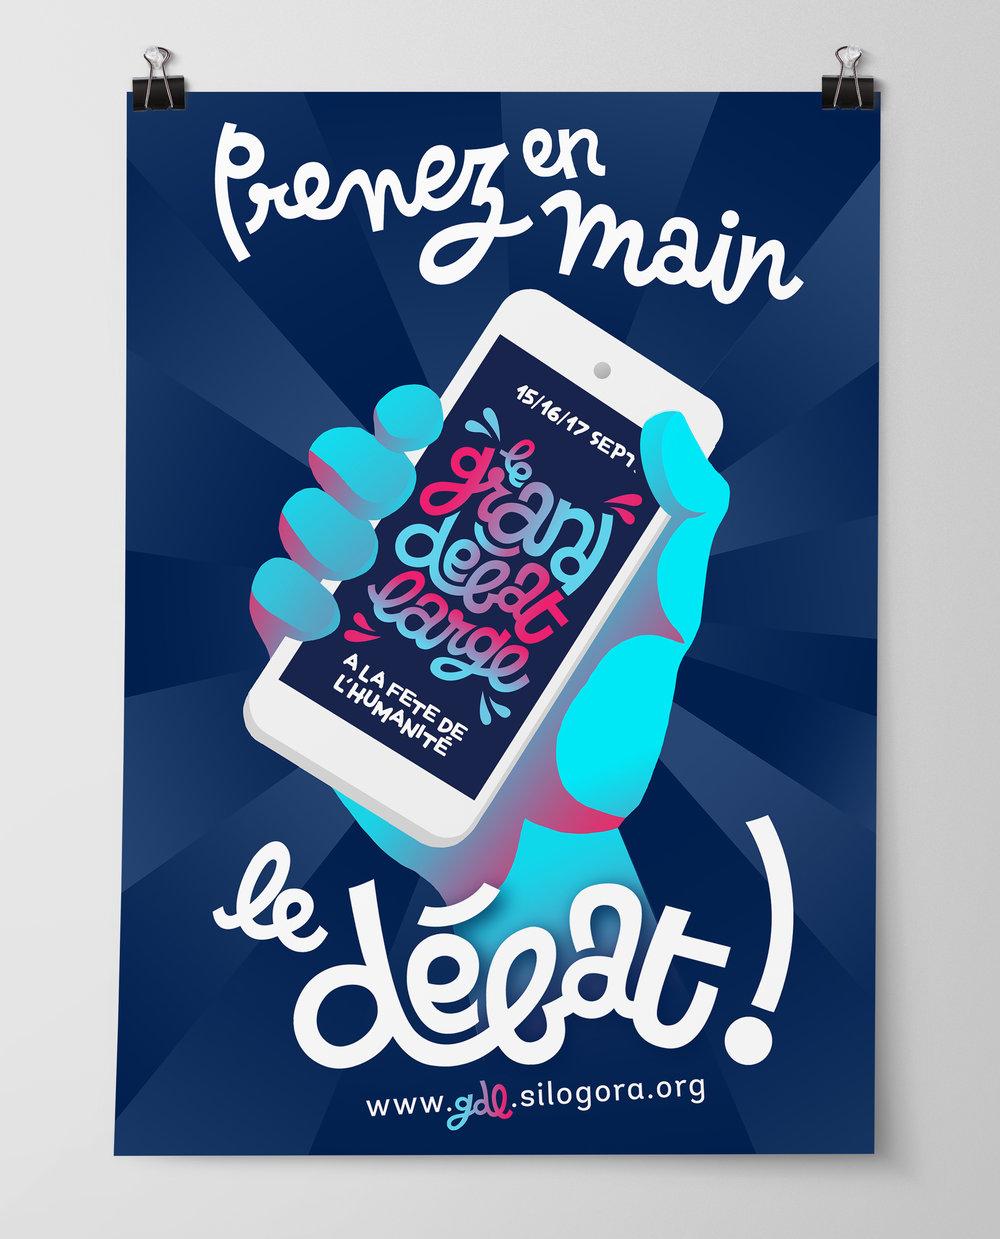 grand-débat-large-poster-blue-pabloka-chispa.jpg